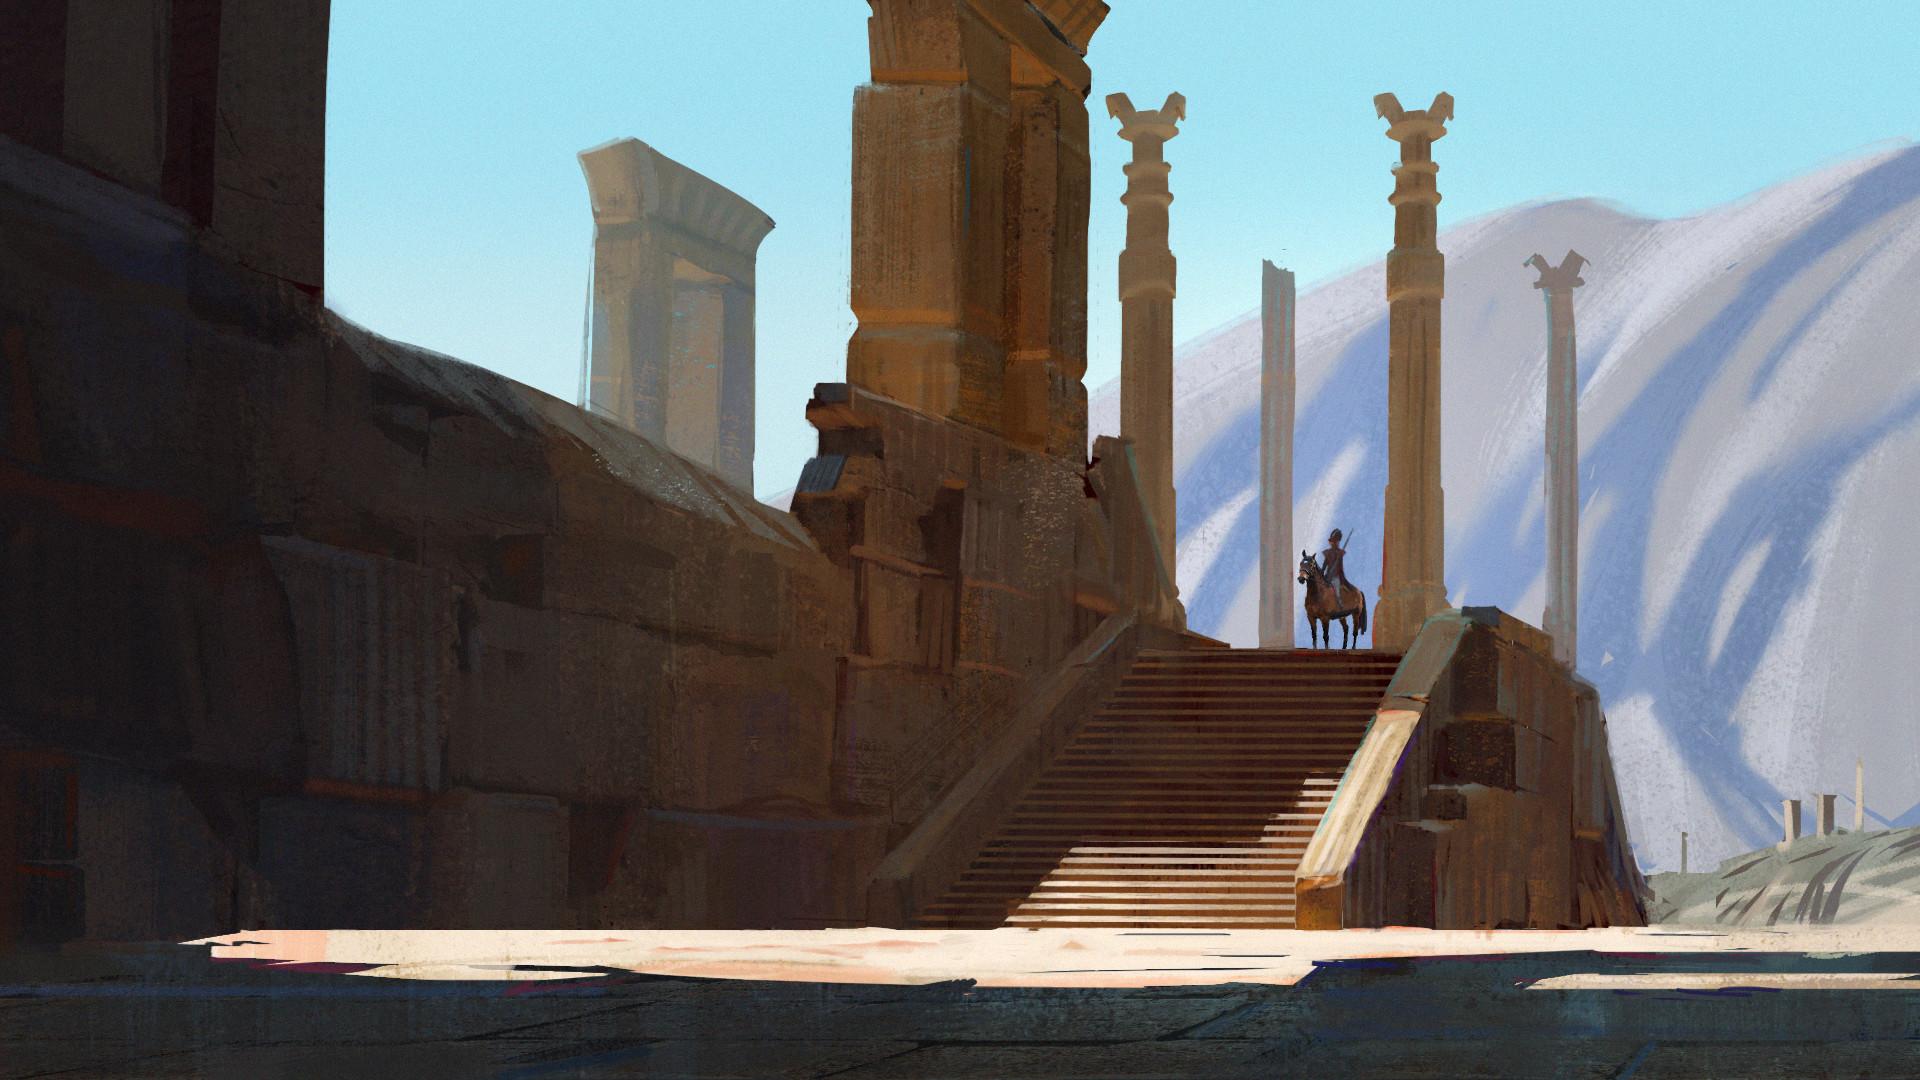 Persepolis Ancient Persepolis 1724231 Hd Wallpaper Backgrounds Download